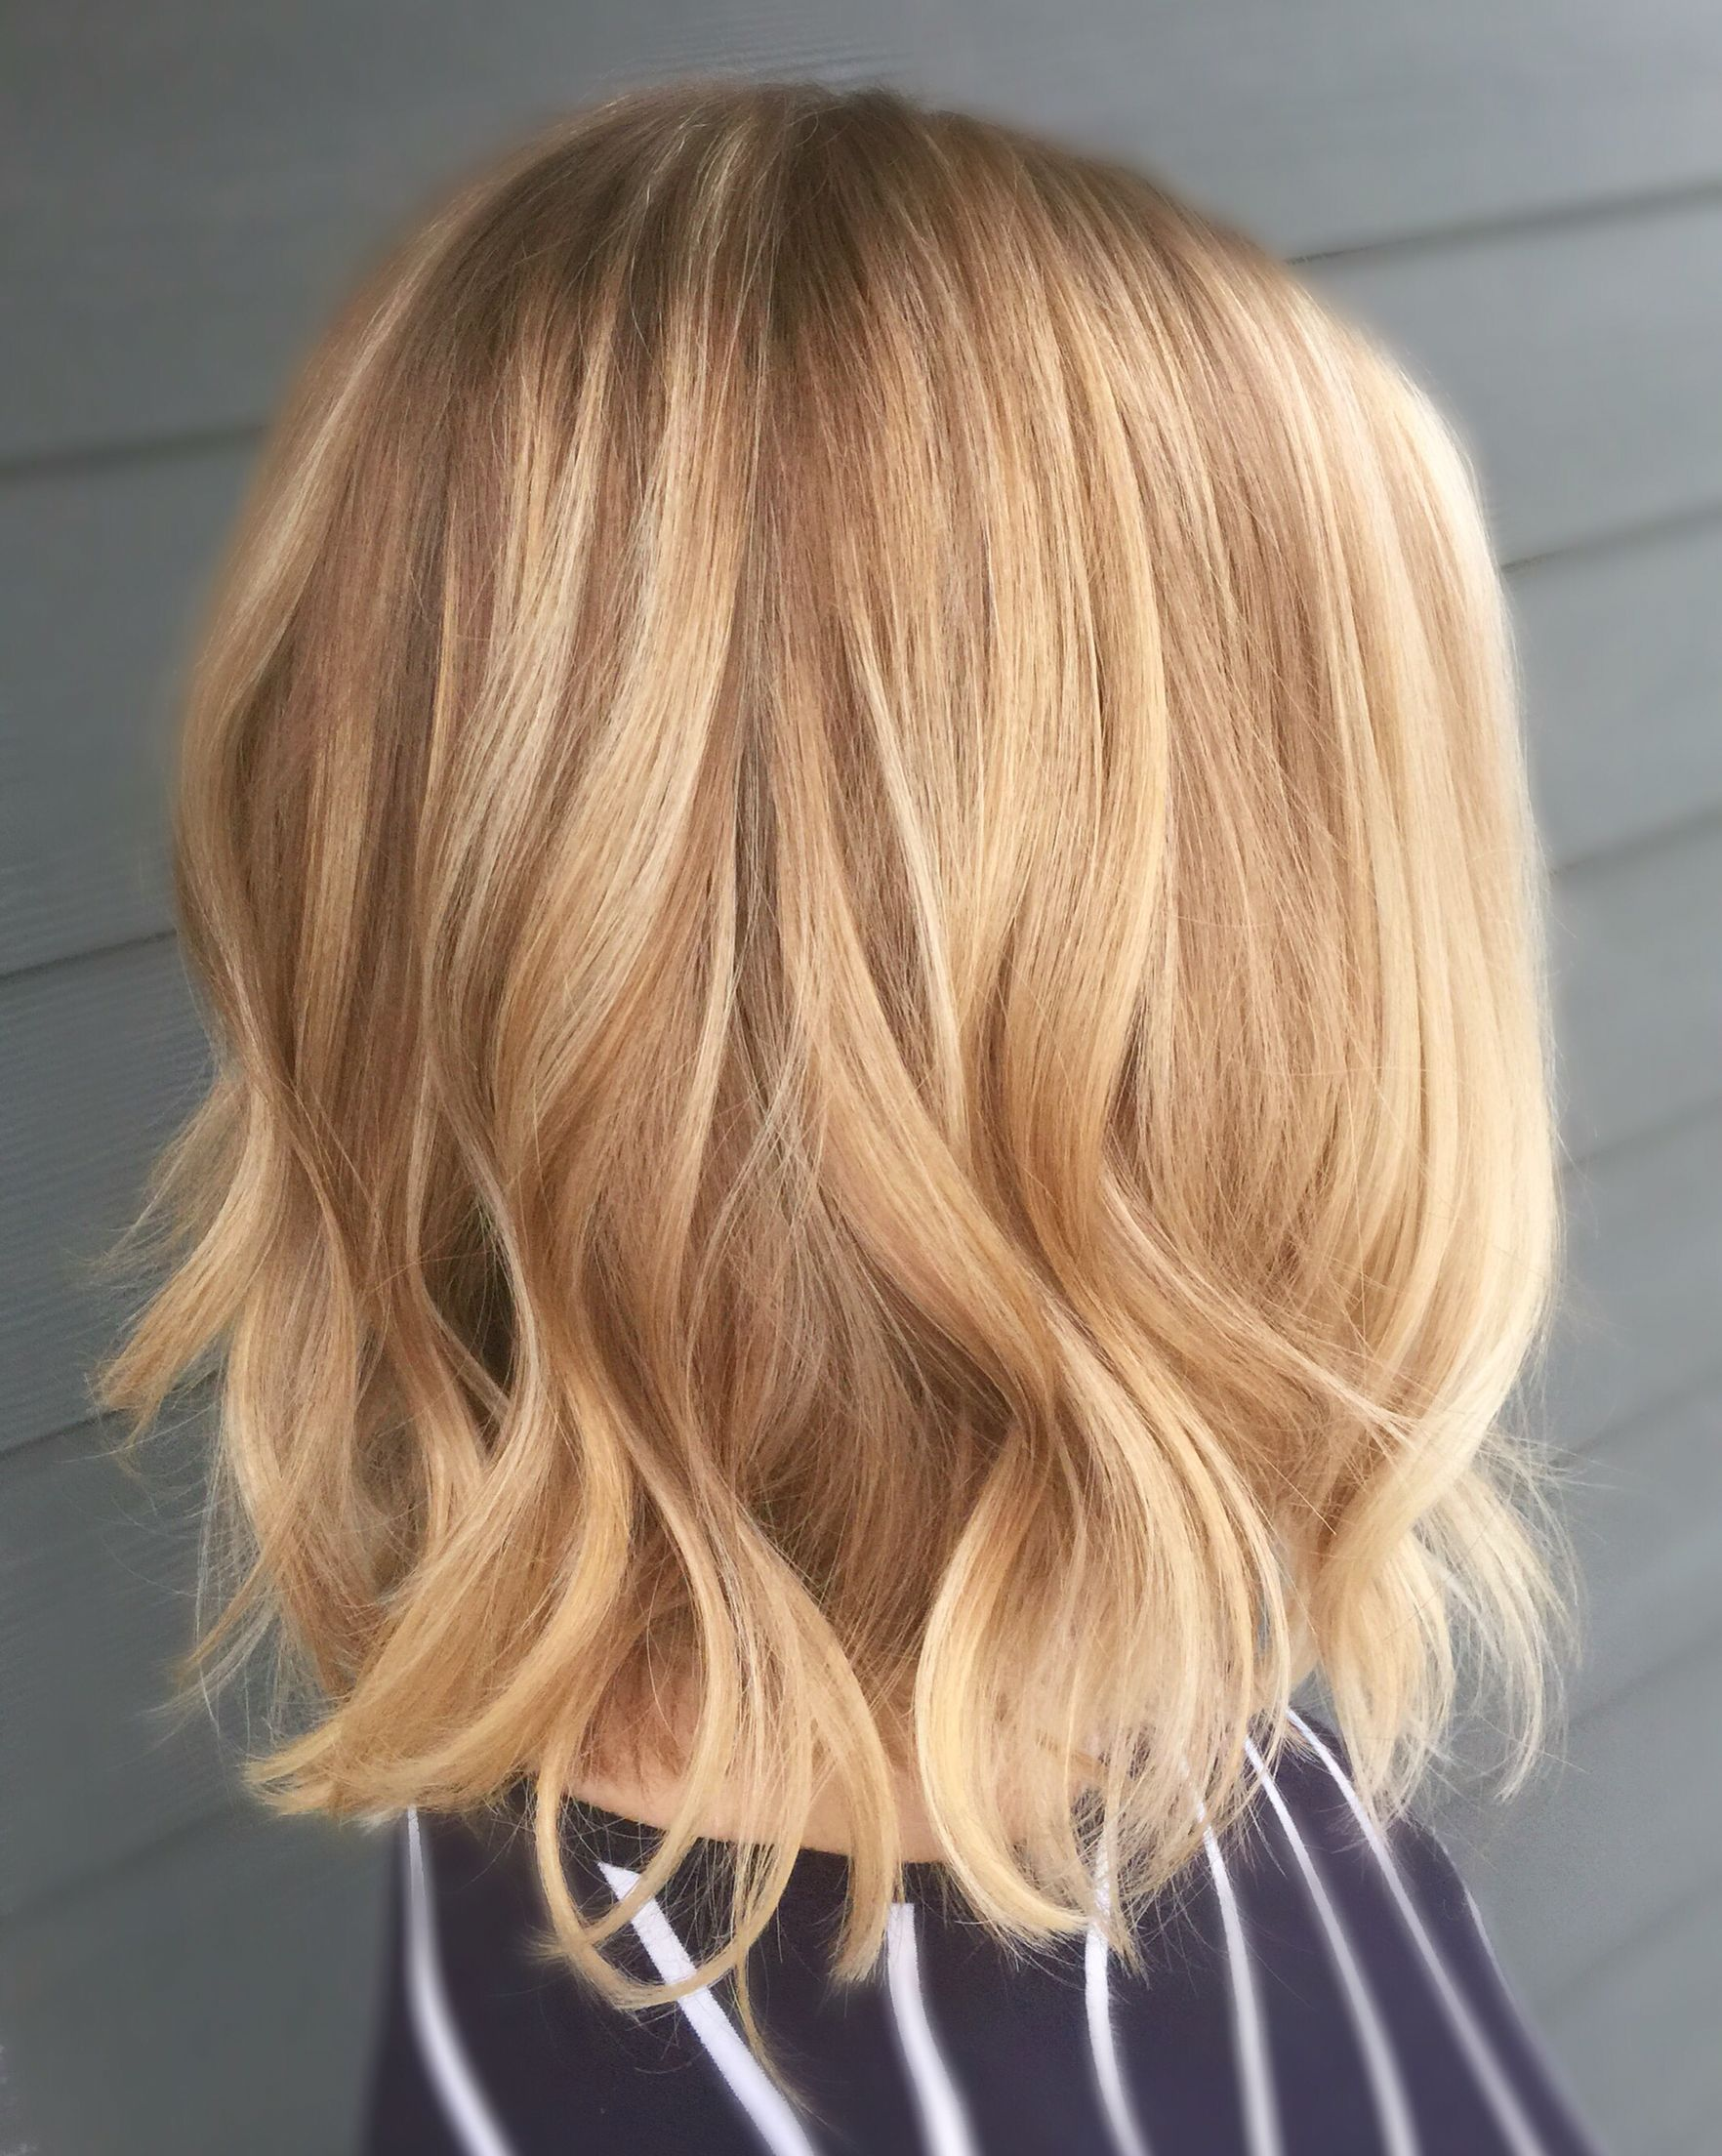 Blonde balayage short hair wavy lob curled hair coiffure